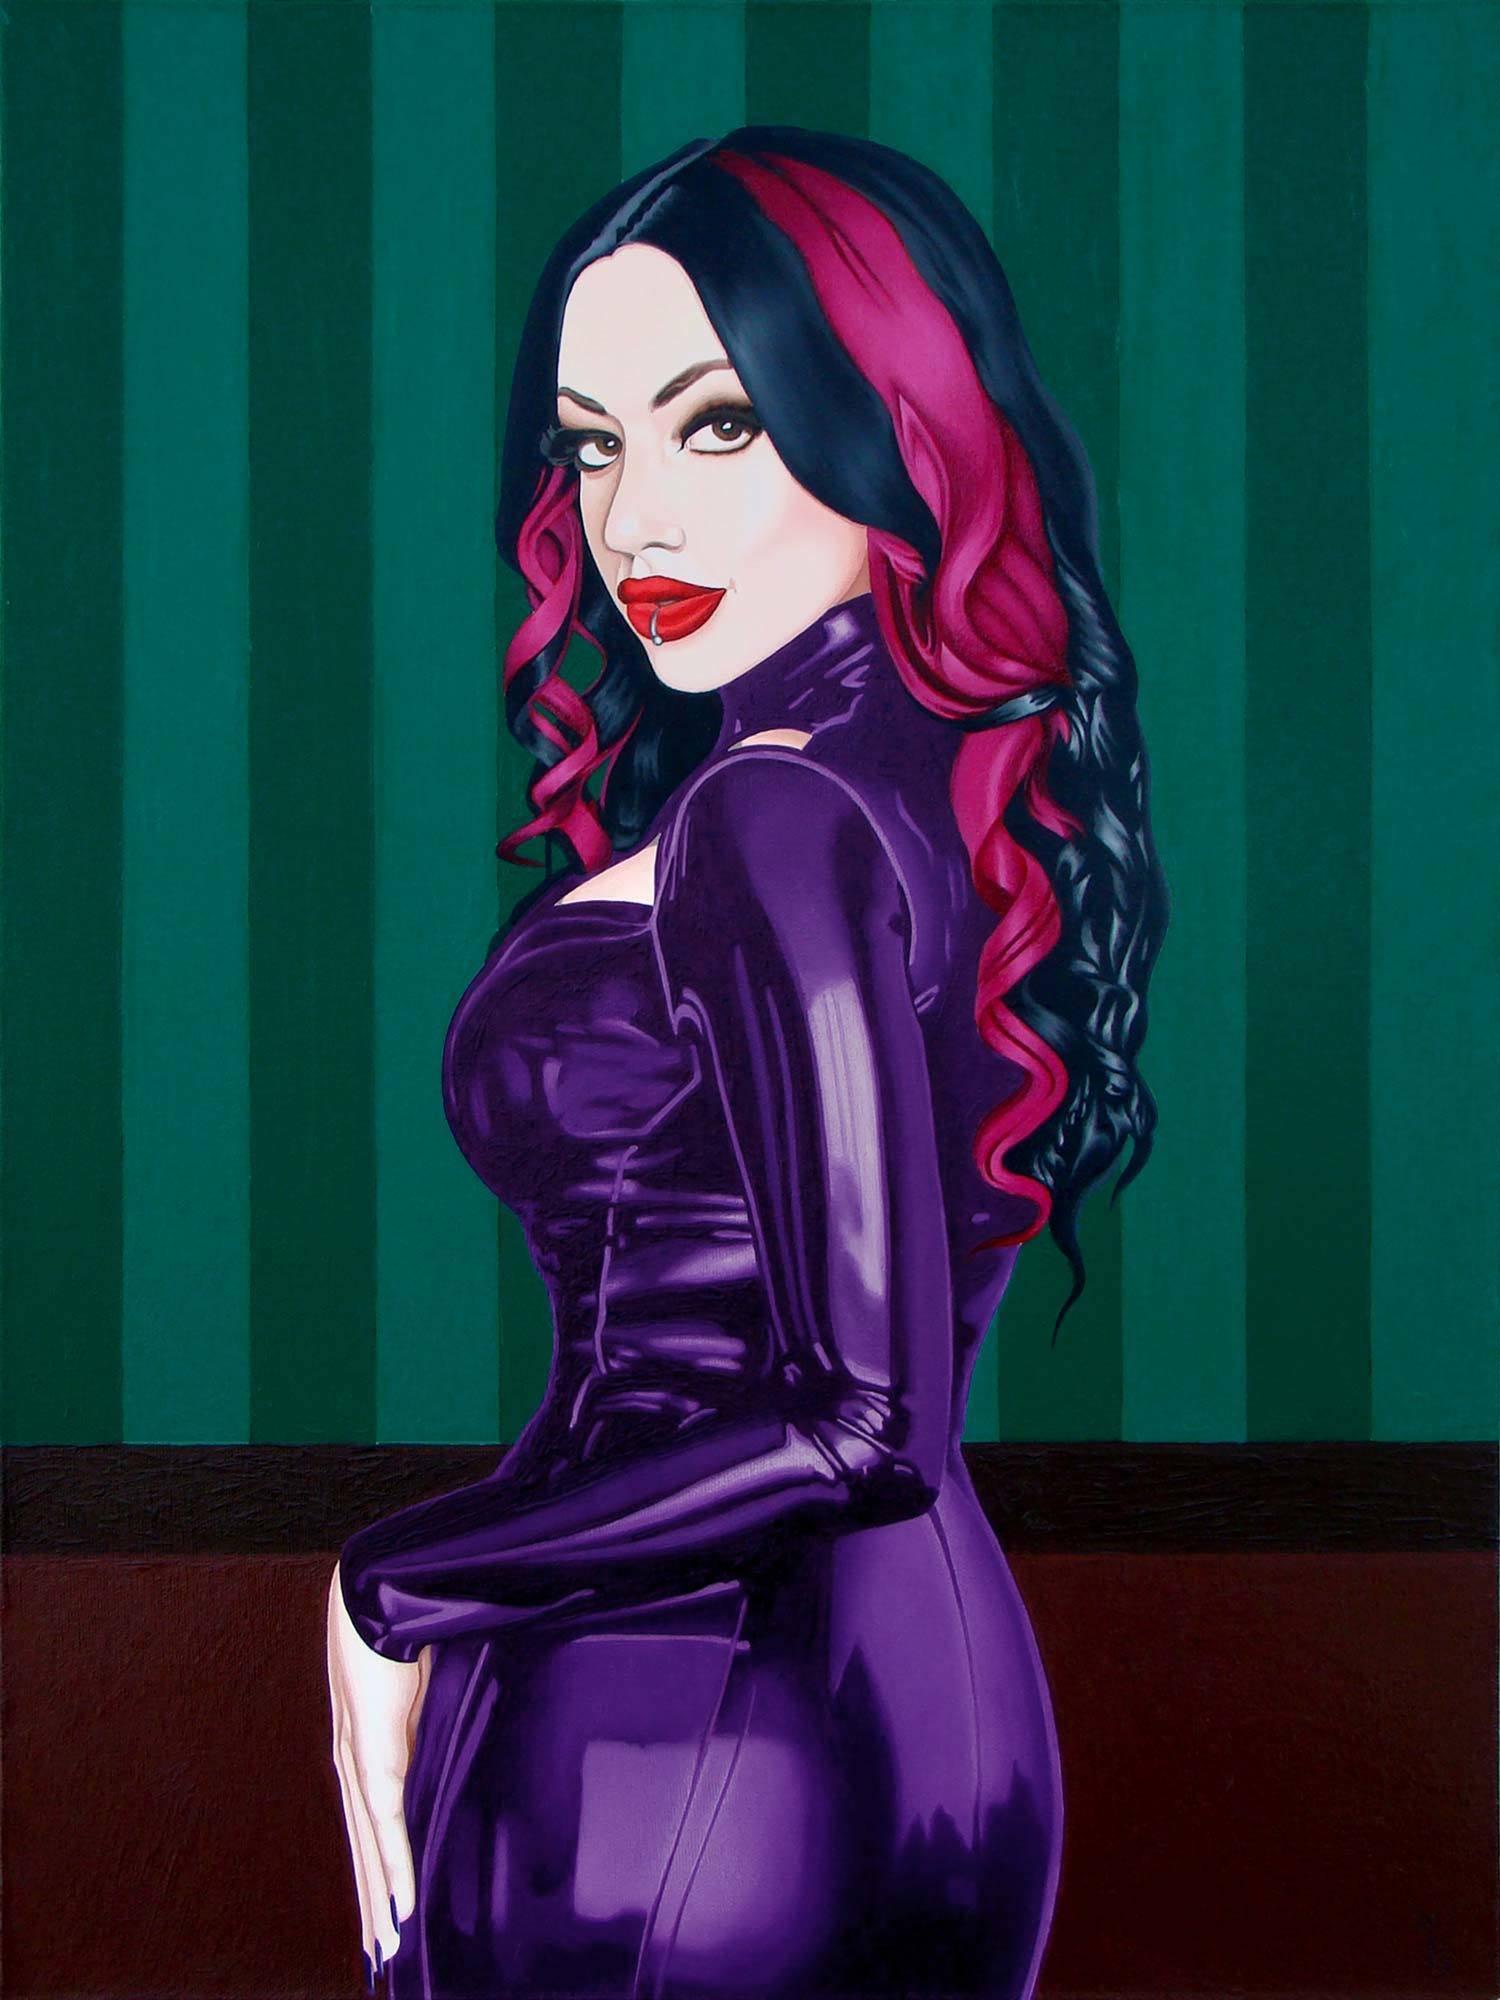 Danielle Harris холст/масло 80 см x 60 см